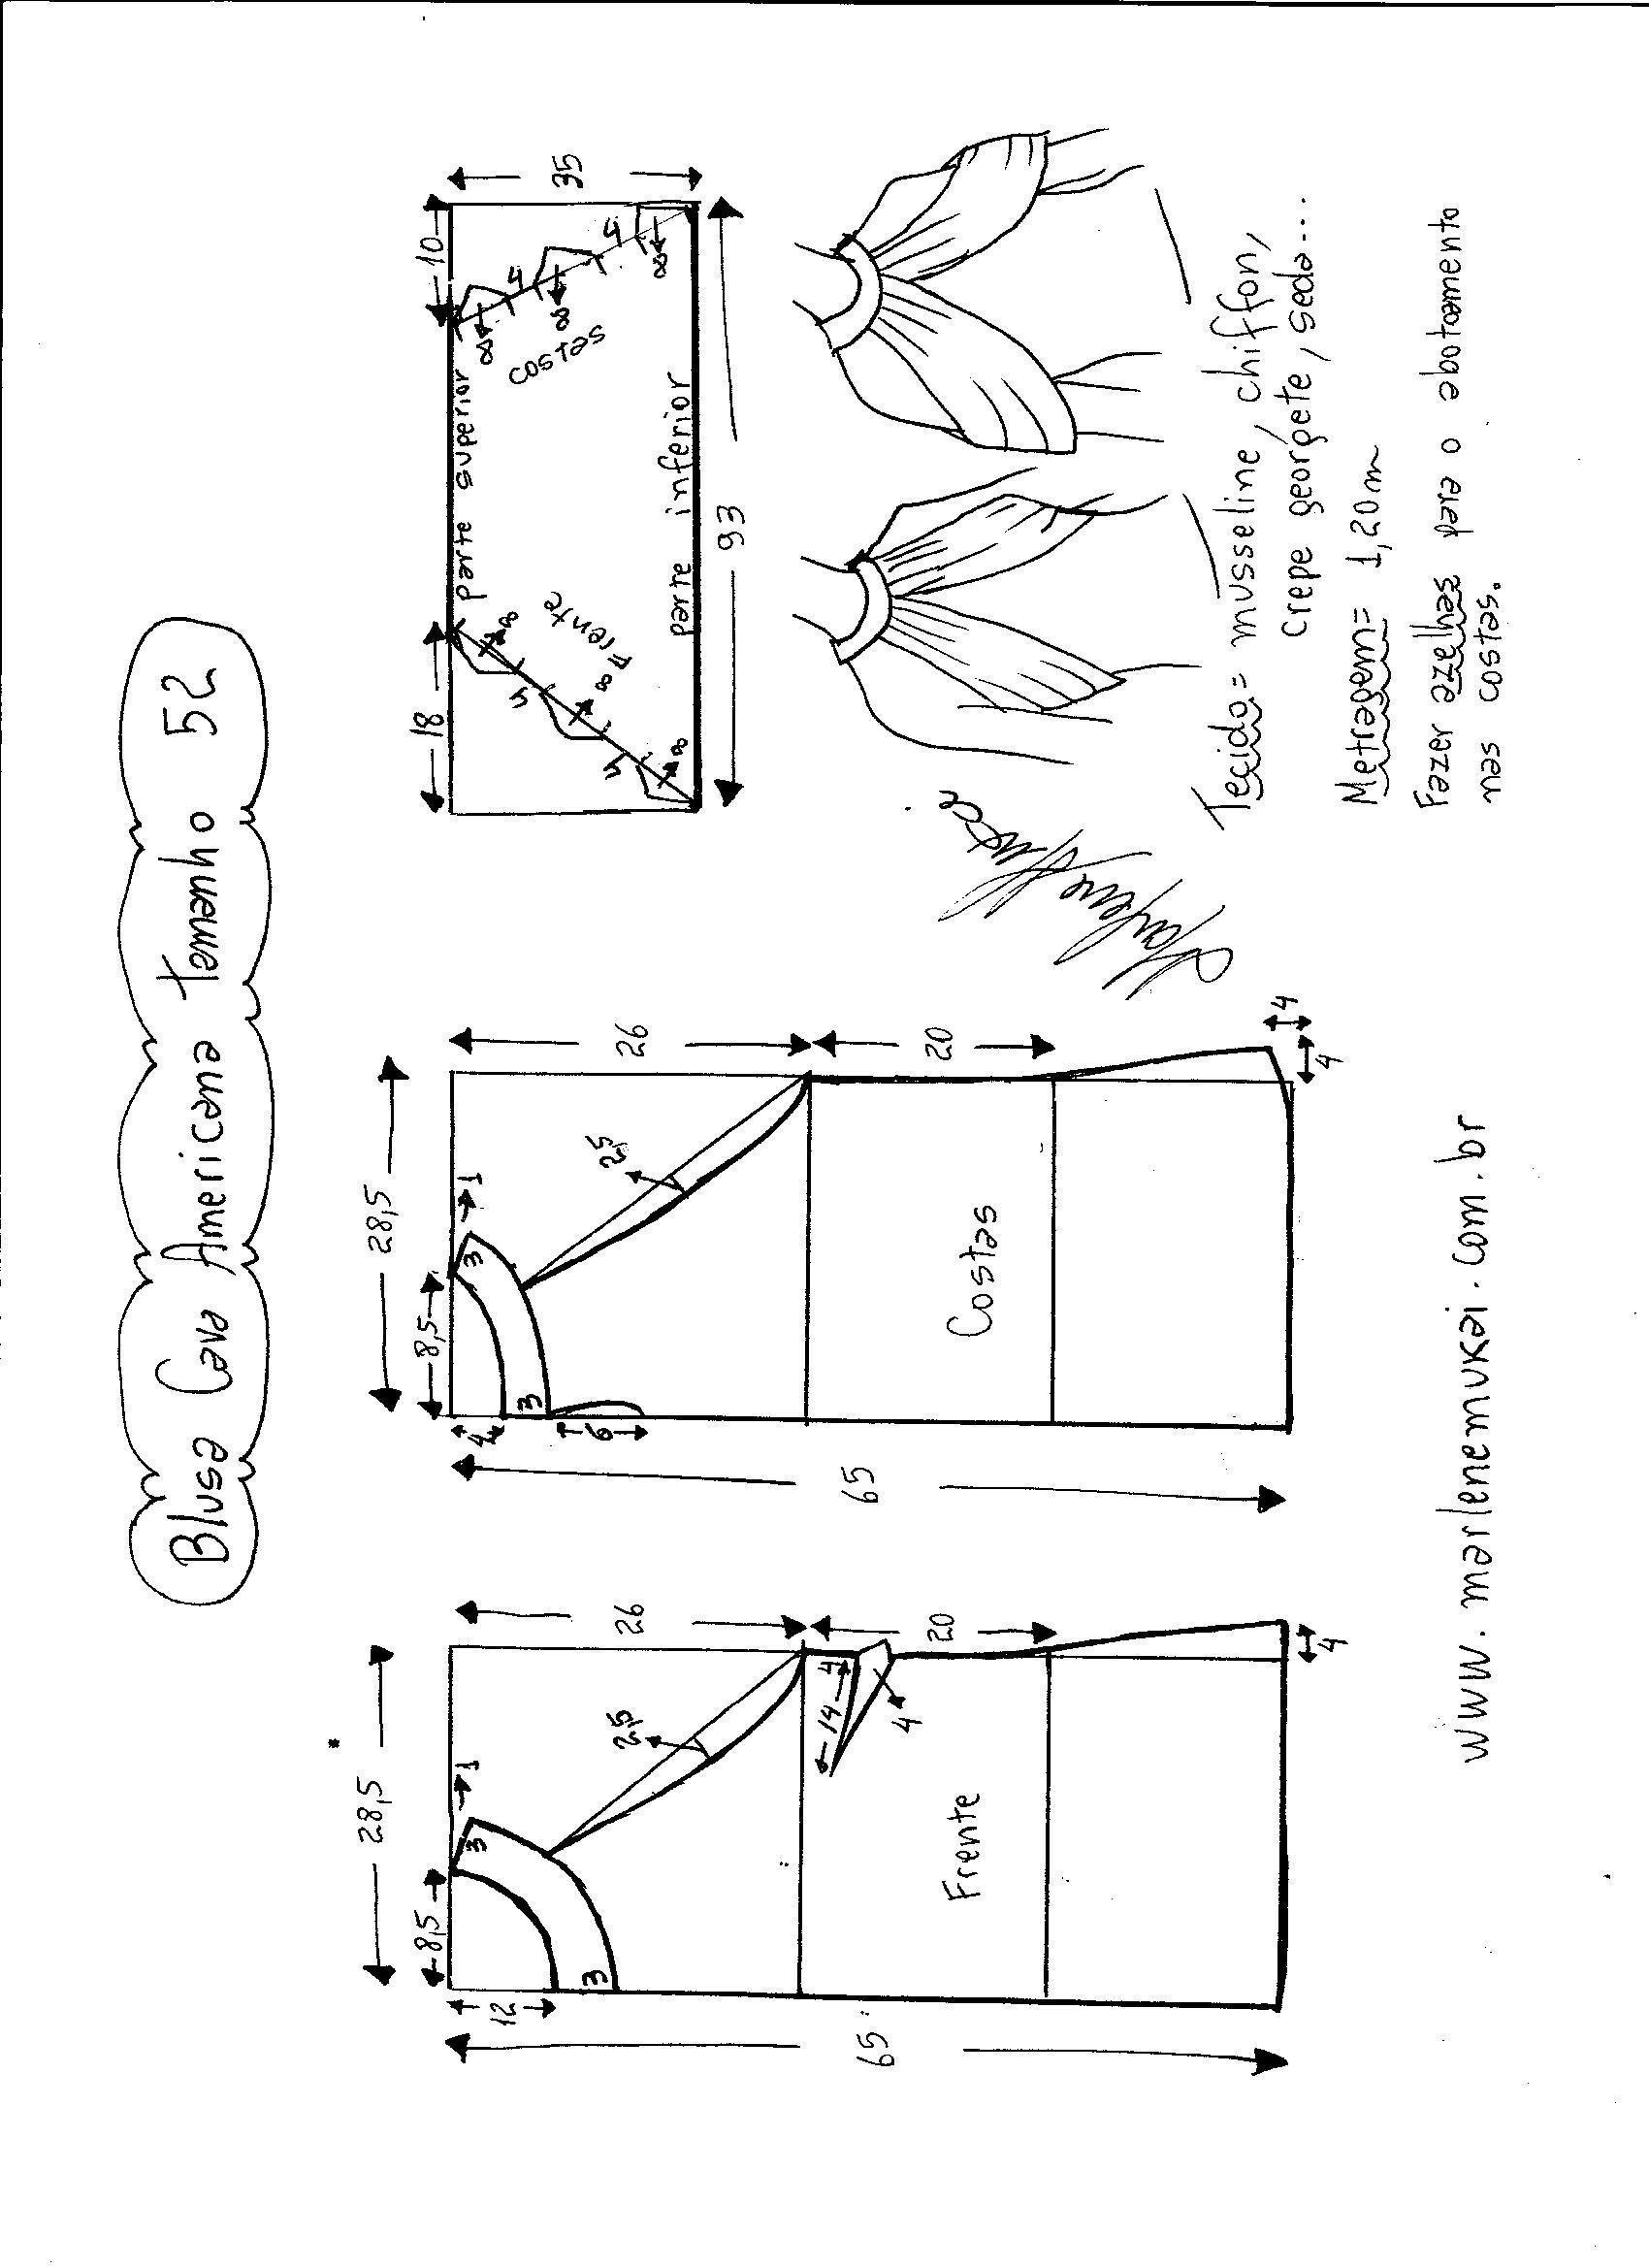 Blusa de sisa americana con drapeado | patrones | Pinterest ...